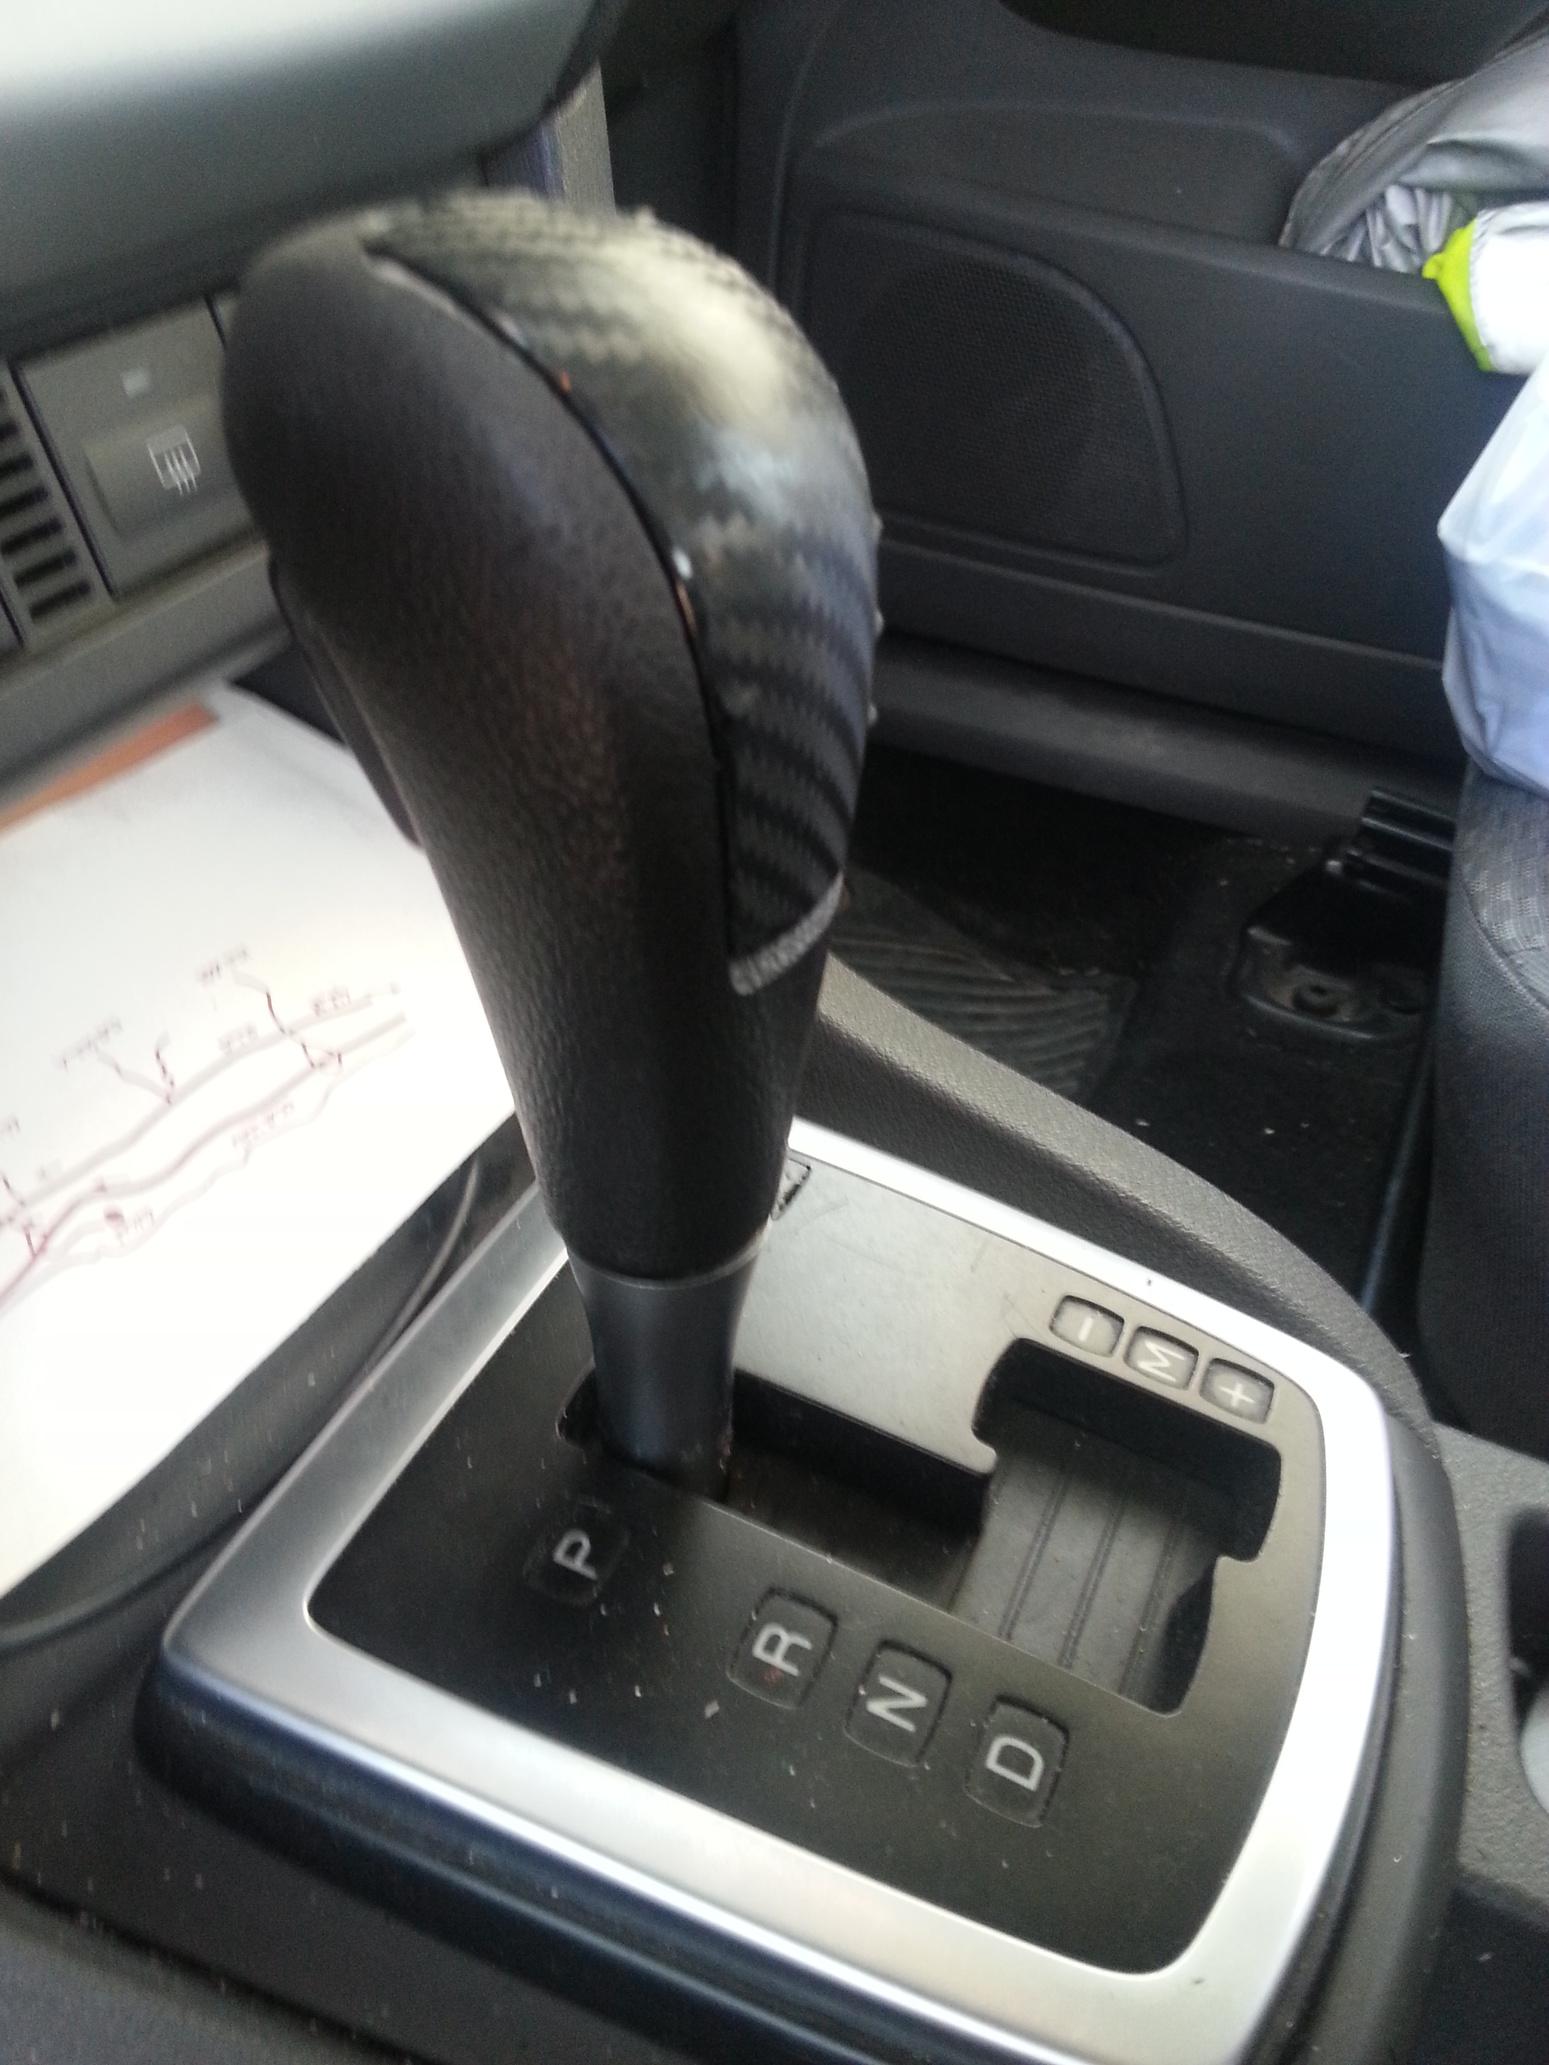 Removing auto gear shaft on ford focus 2006 uploadfromtaptalk1442154304106 jpg